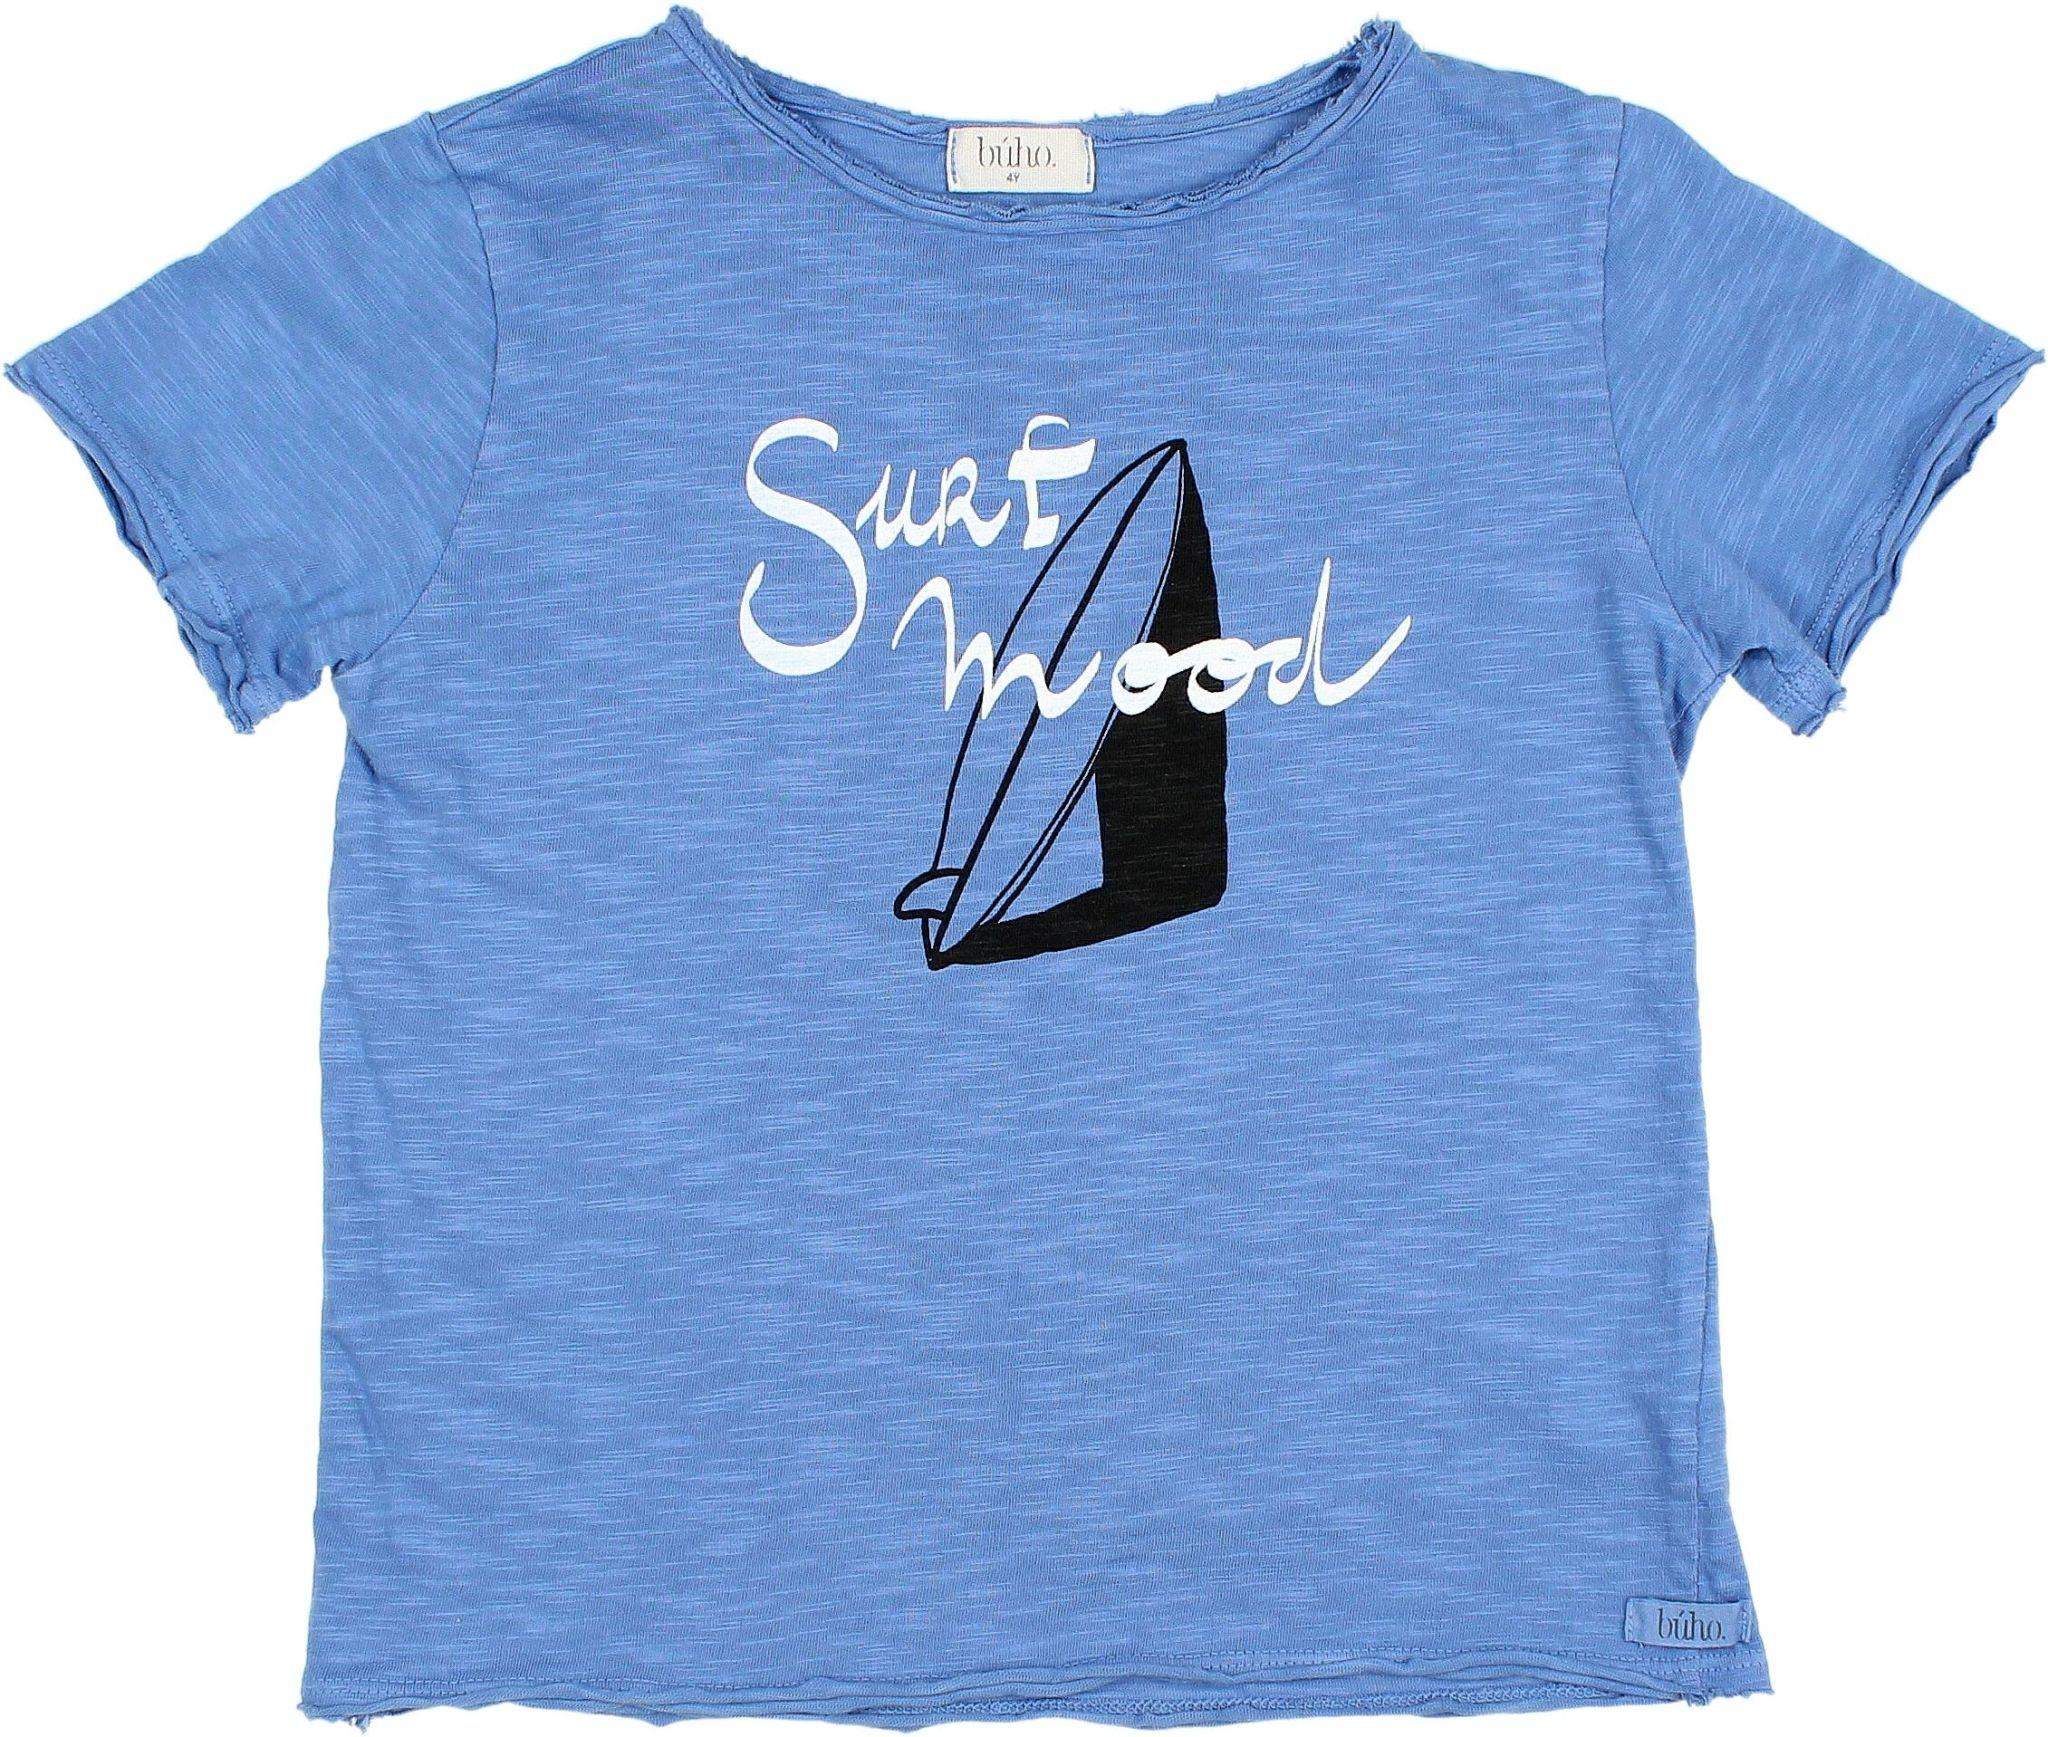 Buho Buho - 9254 Surf t-shirt Marina